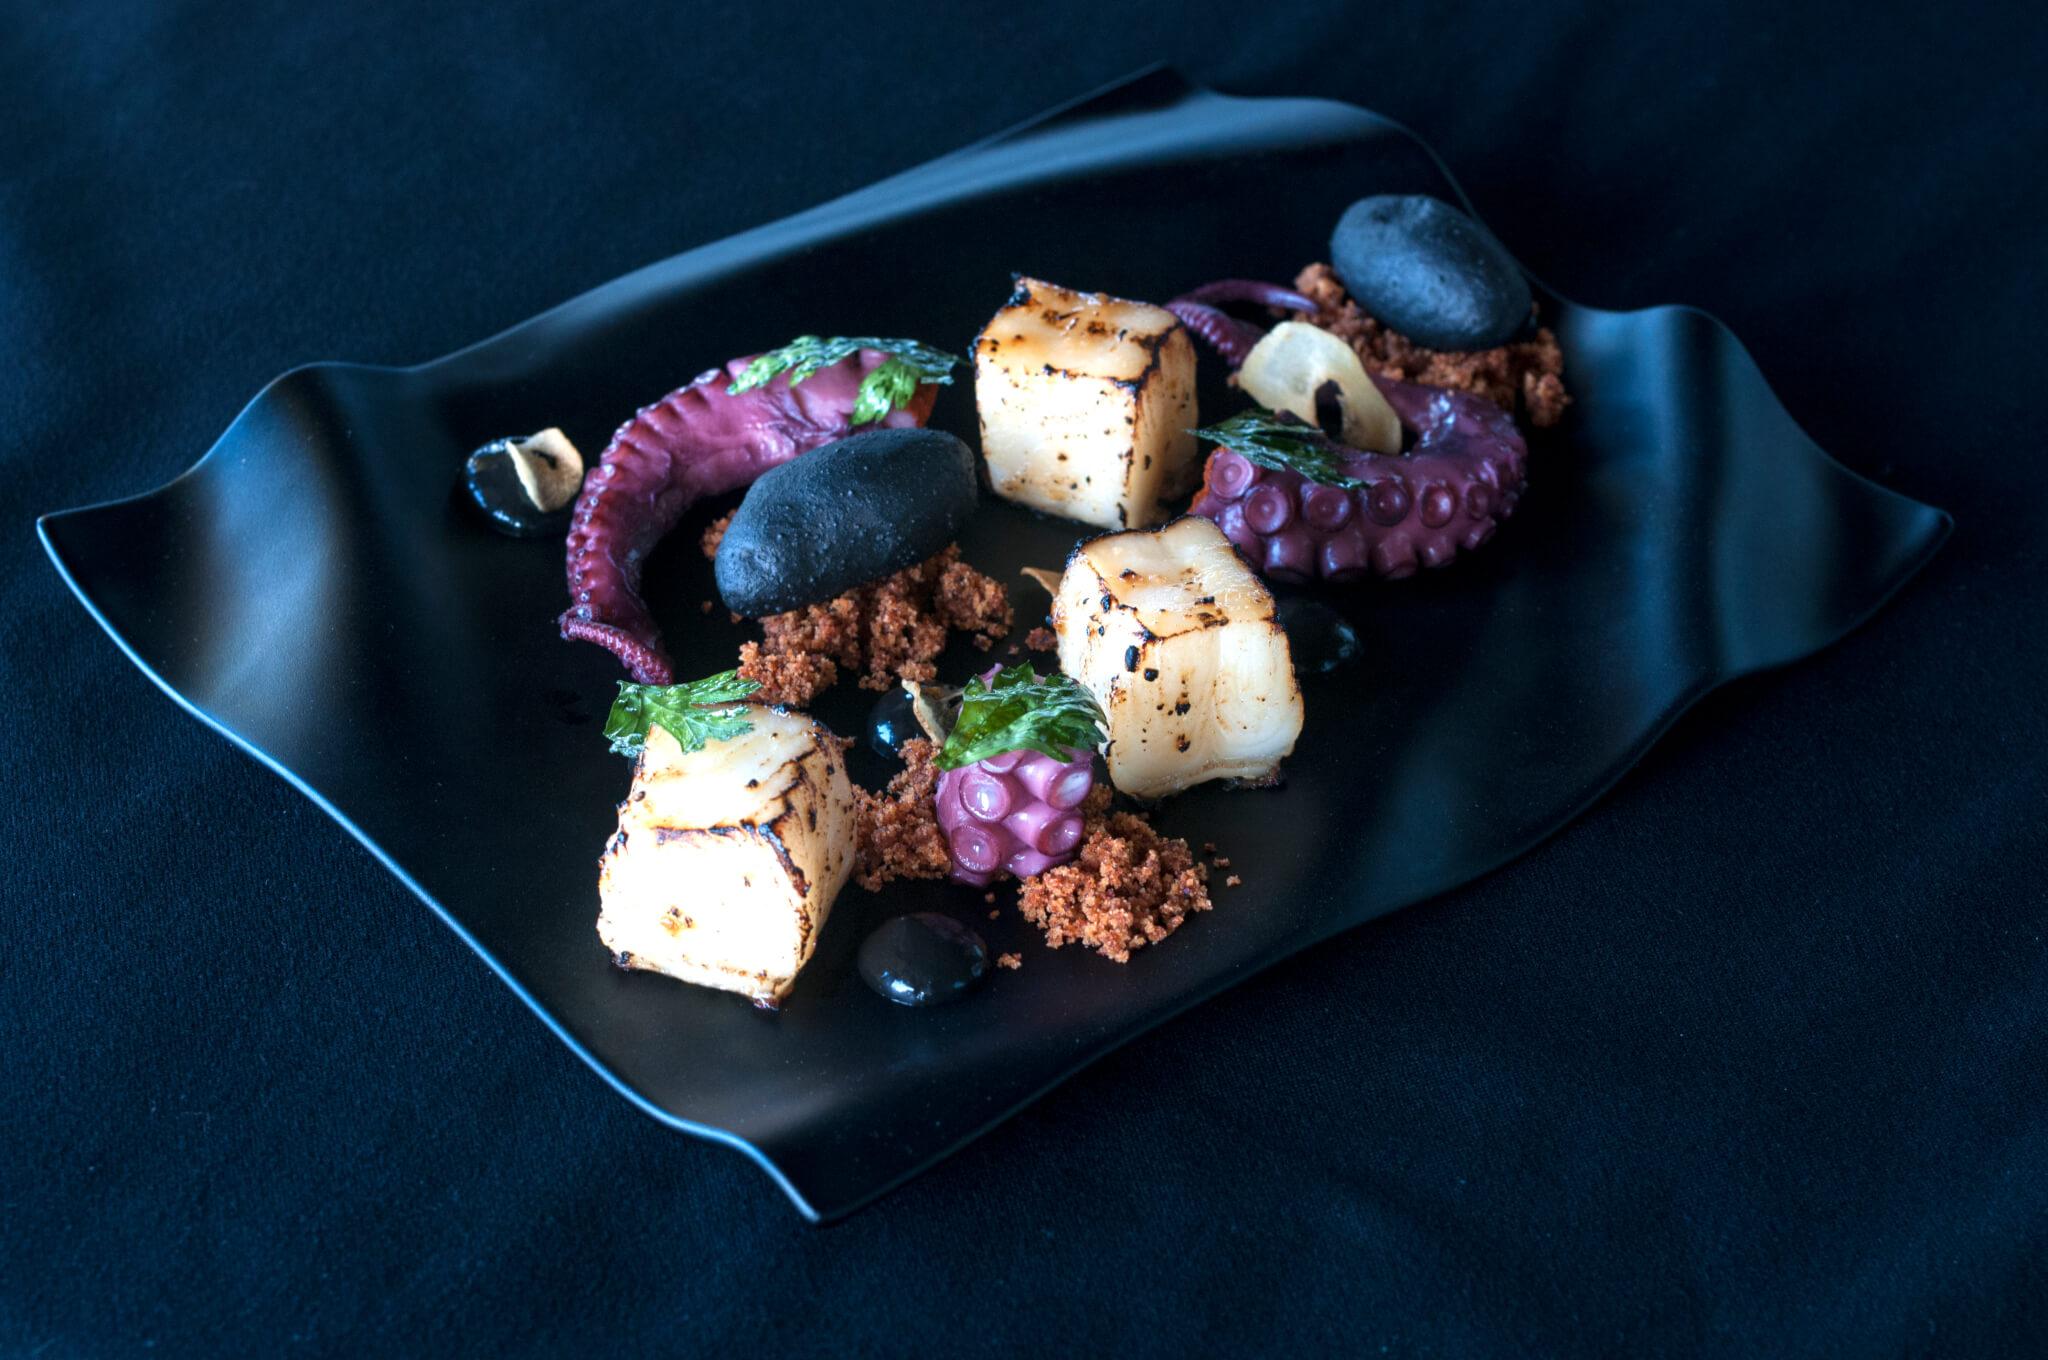 Octopus dish Jing restaurant